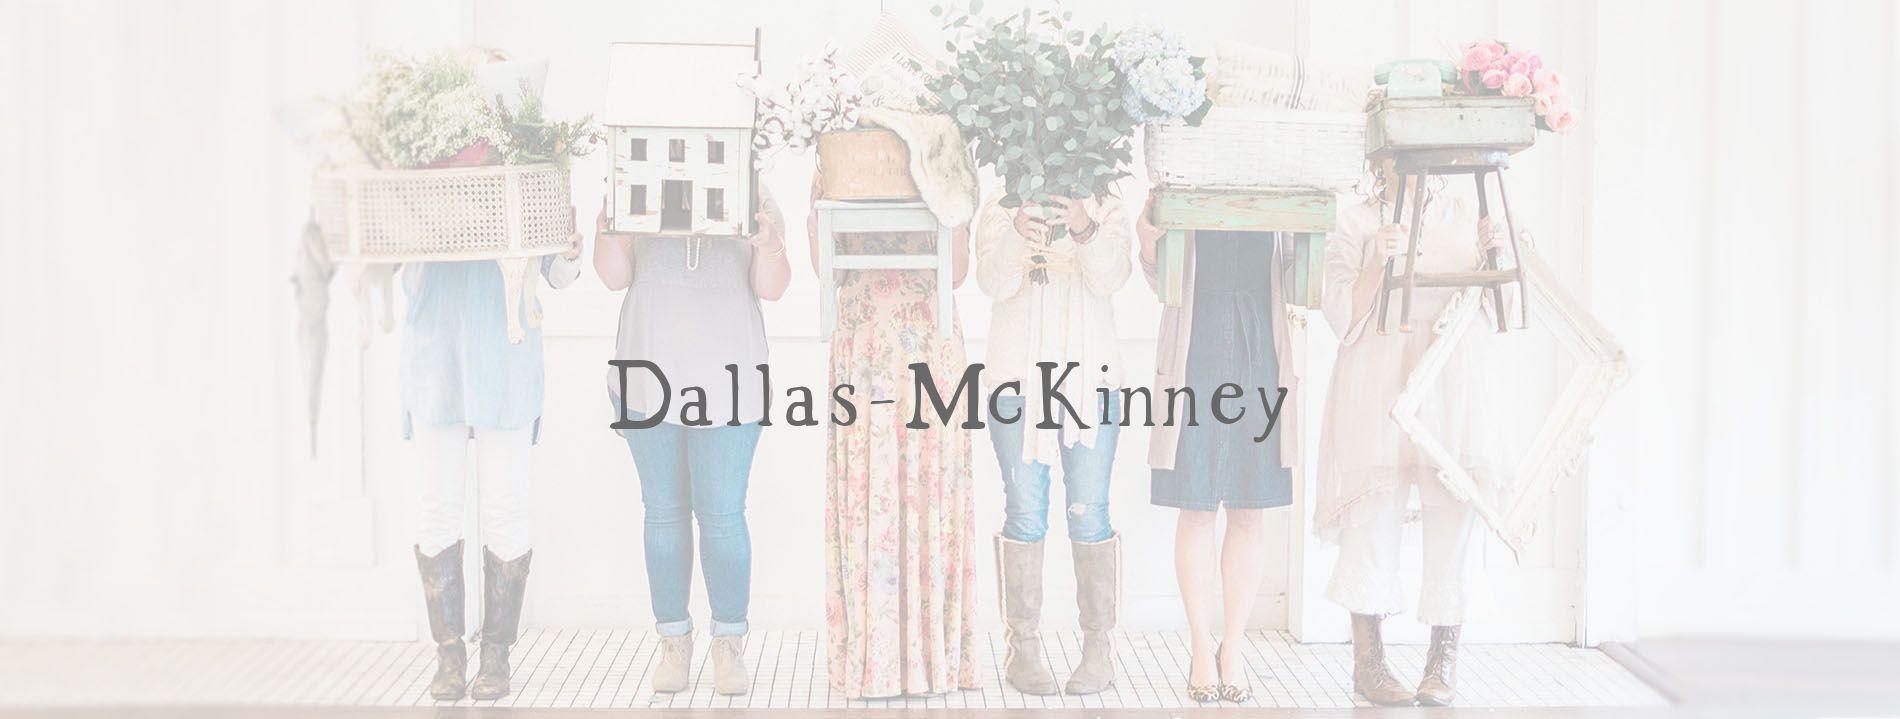 Dallas-McKinney